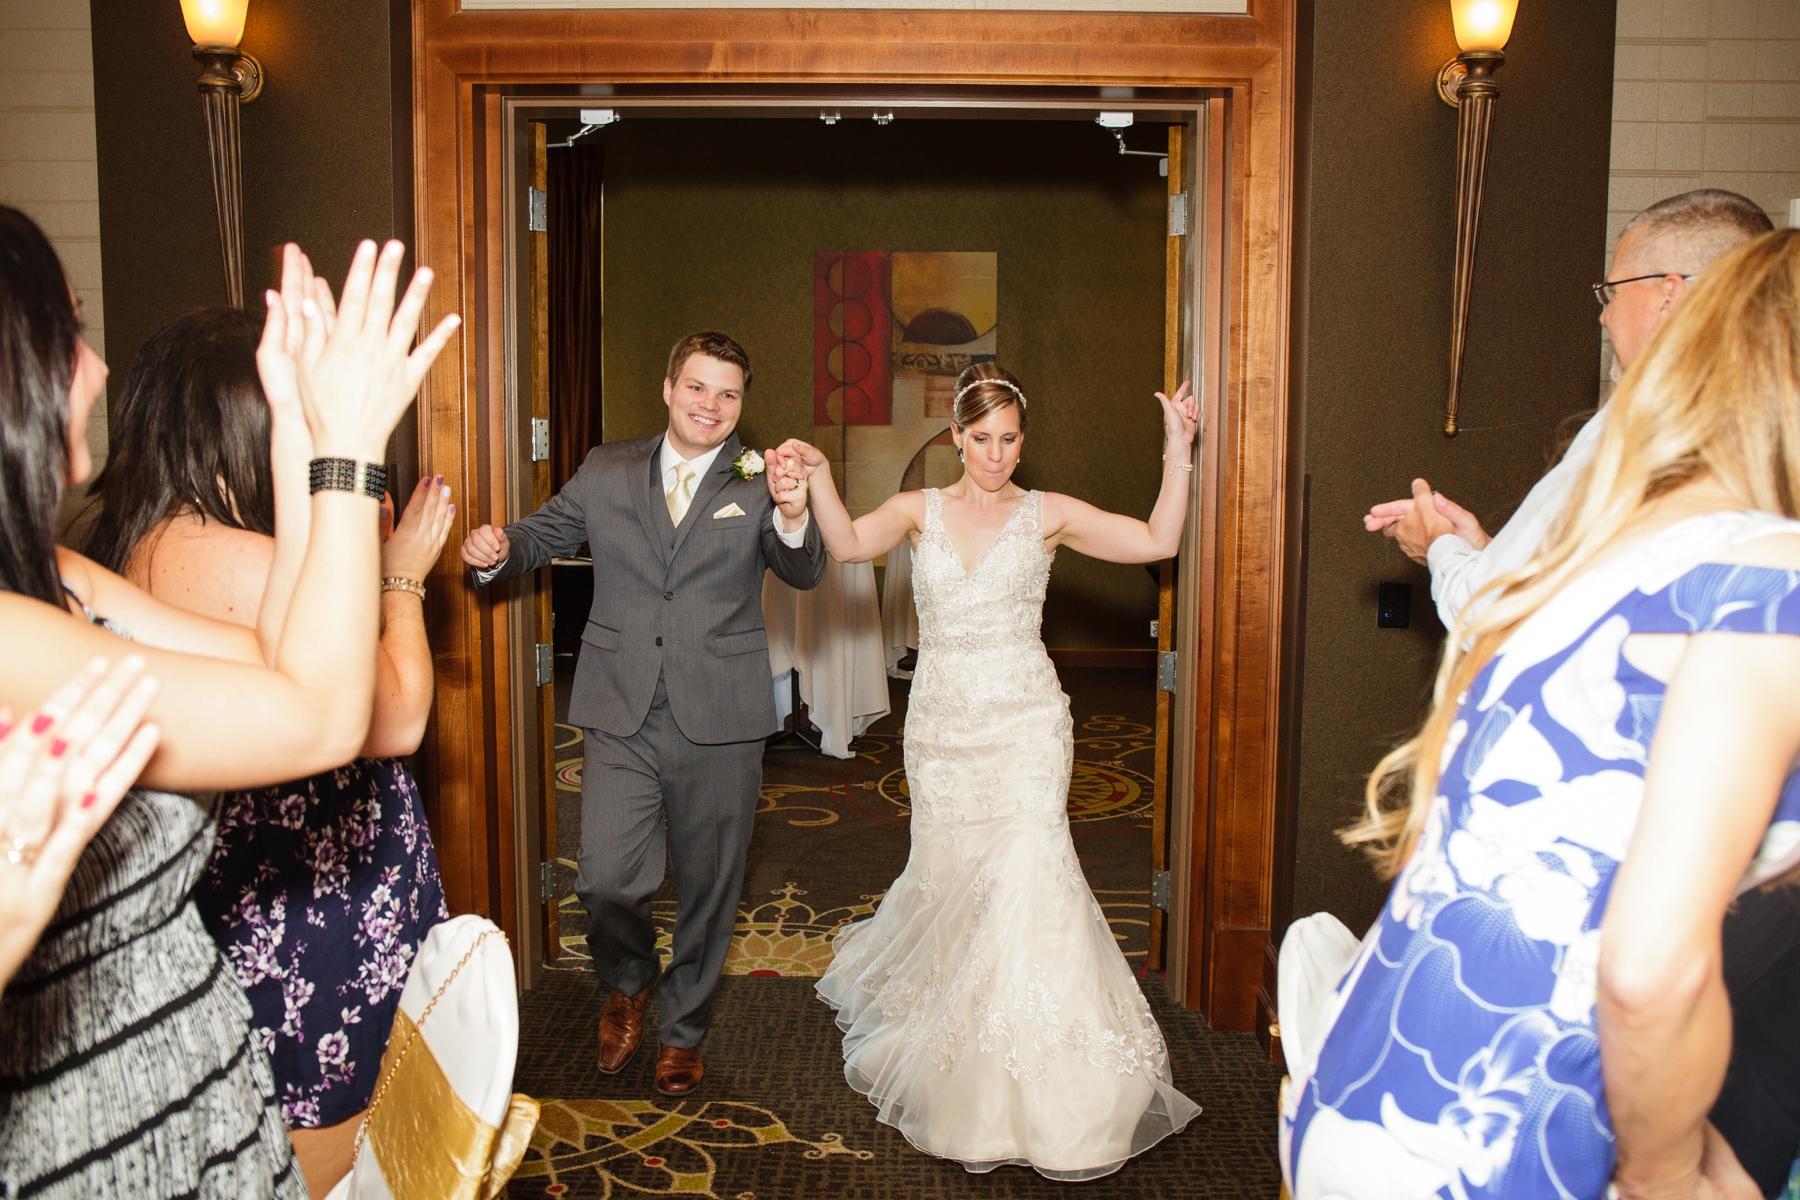 Ben_Jillian_Midland_Baycity_Wedding_0070.jpg